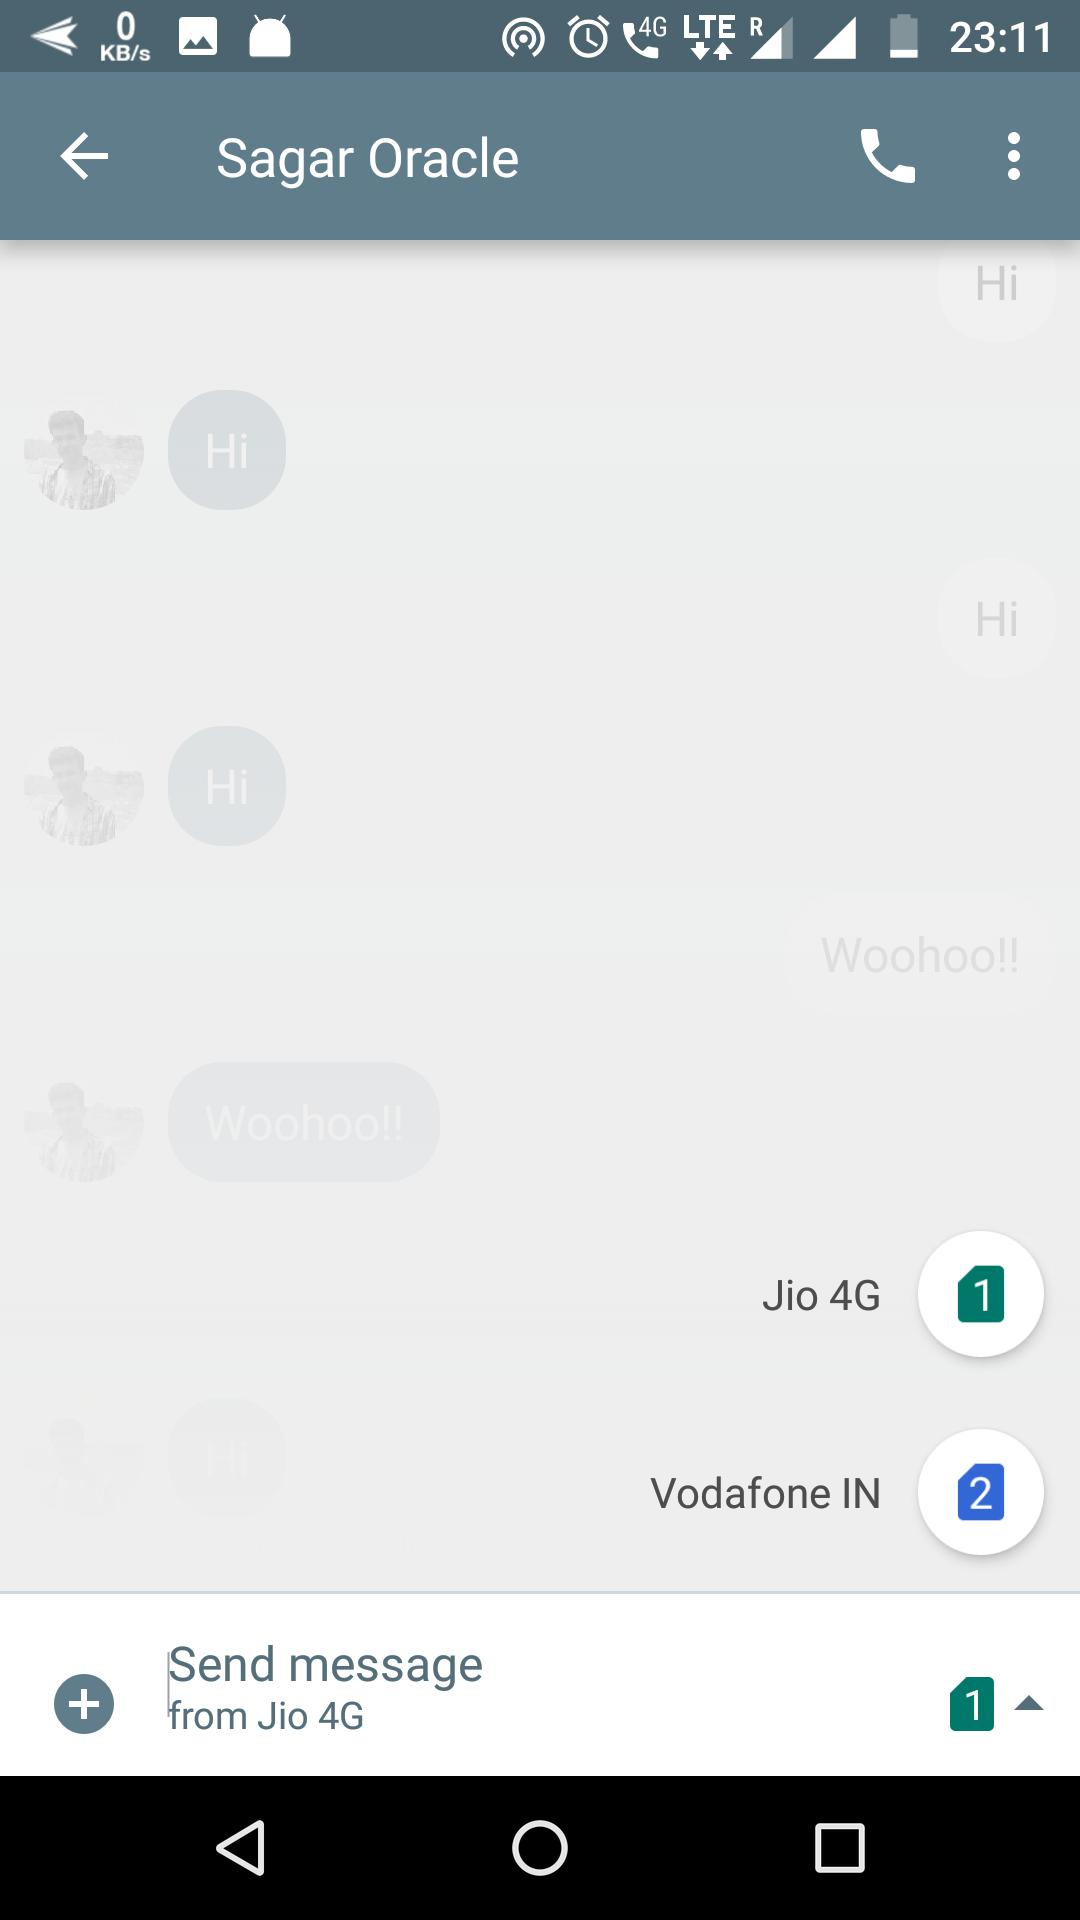 screenshot_20171129-231132